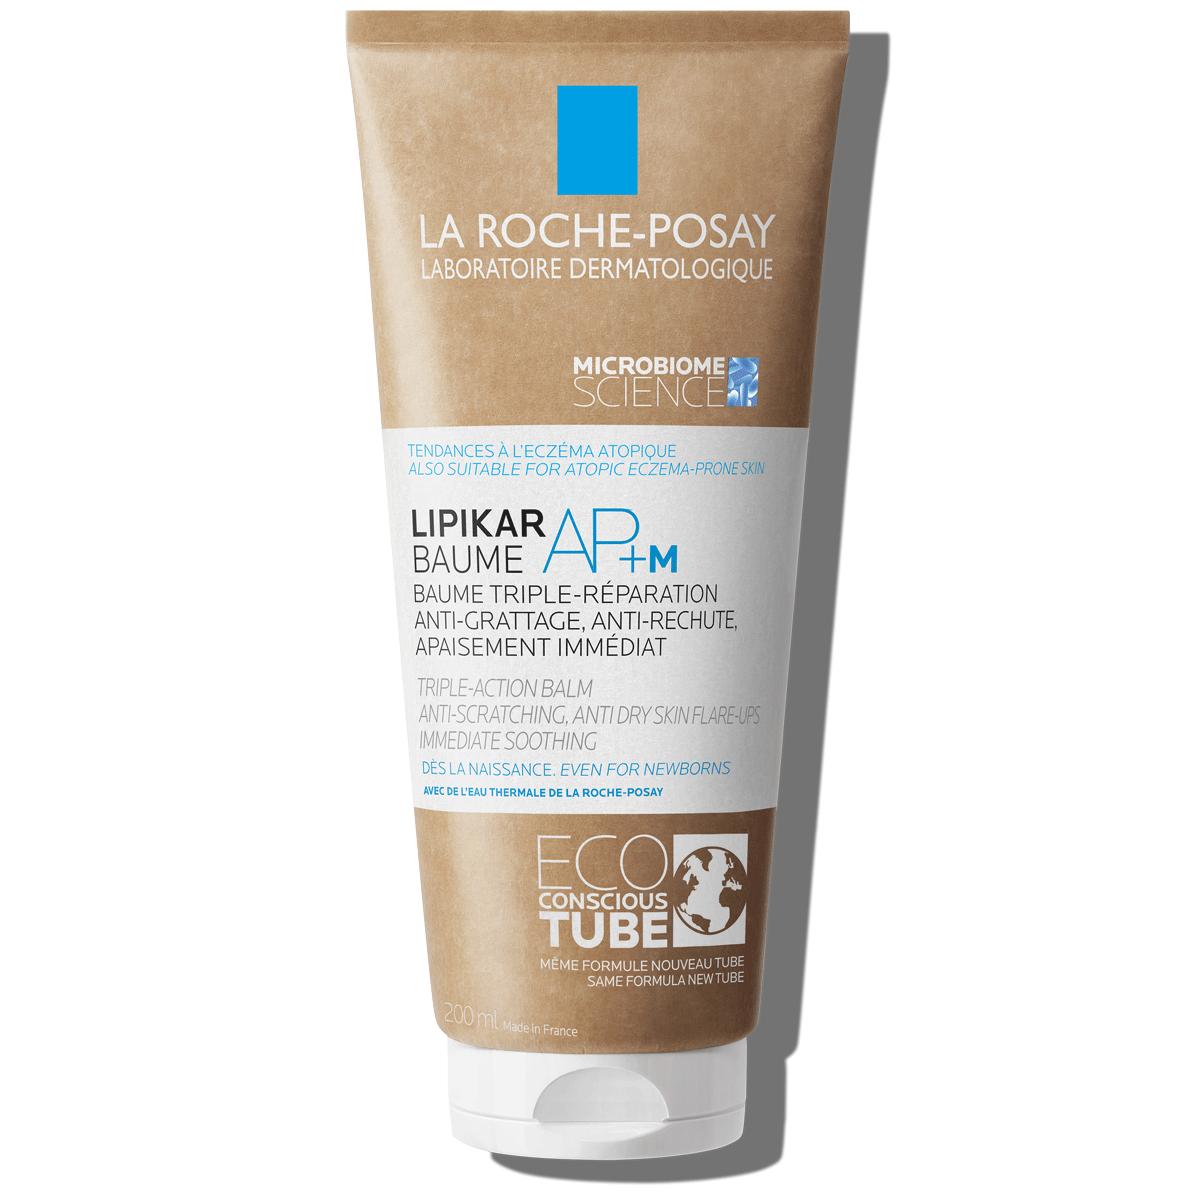 La Roche Posay Eczema Lipikar Baume AP Plus M Eco Conscious Packshot